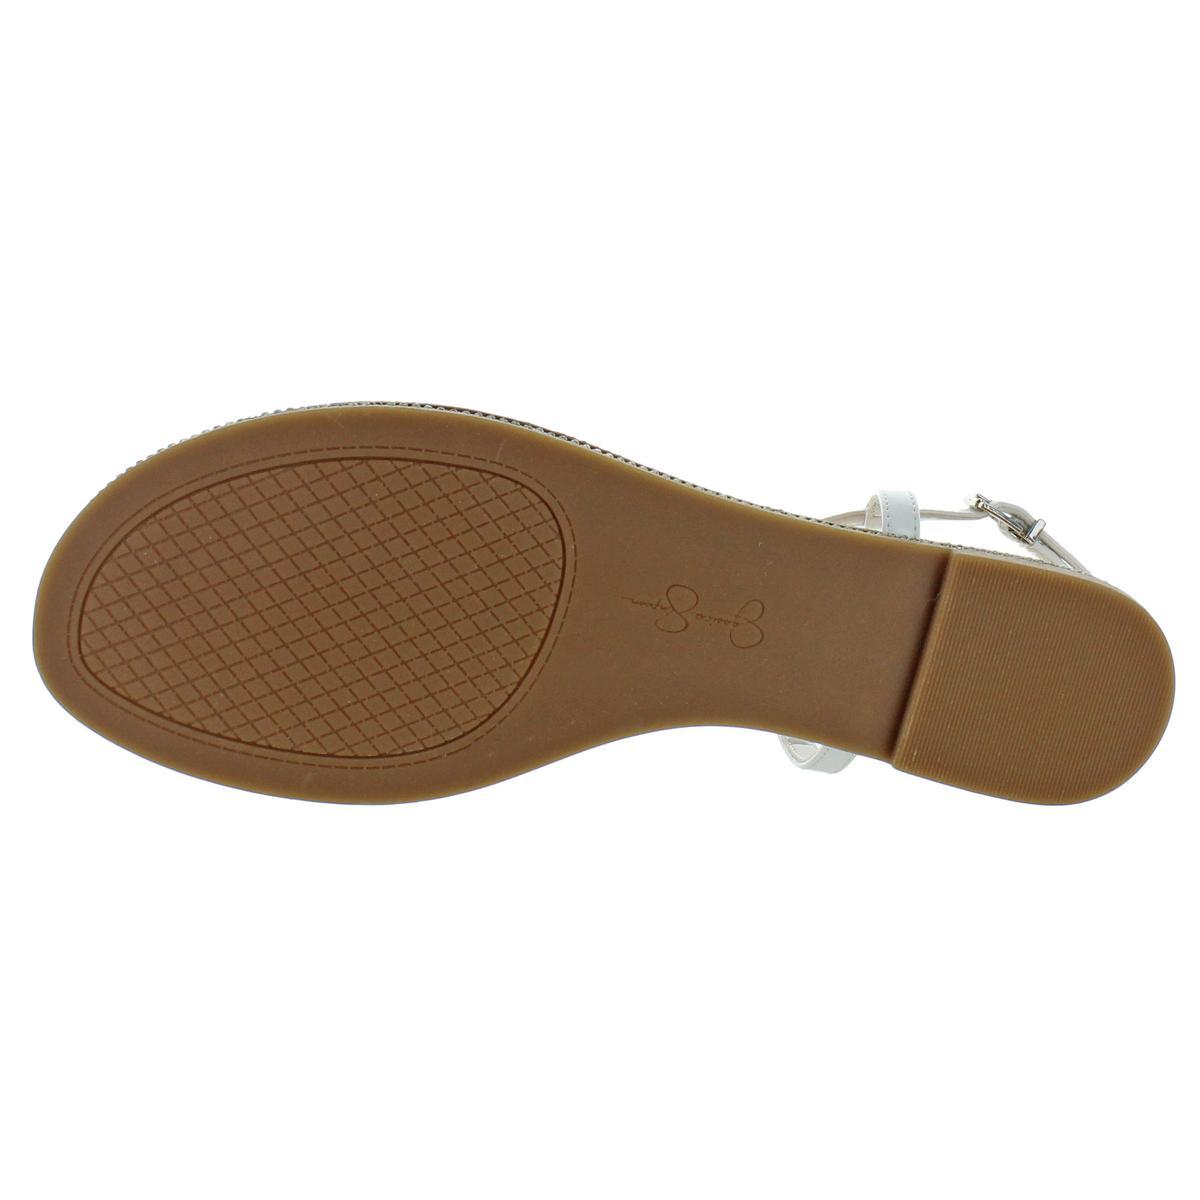 Jessica-Simpson-Femme-Brimah-Casual-String-Spartiates-Chaussures-BHFO-1194 miniature 3